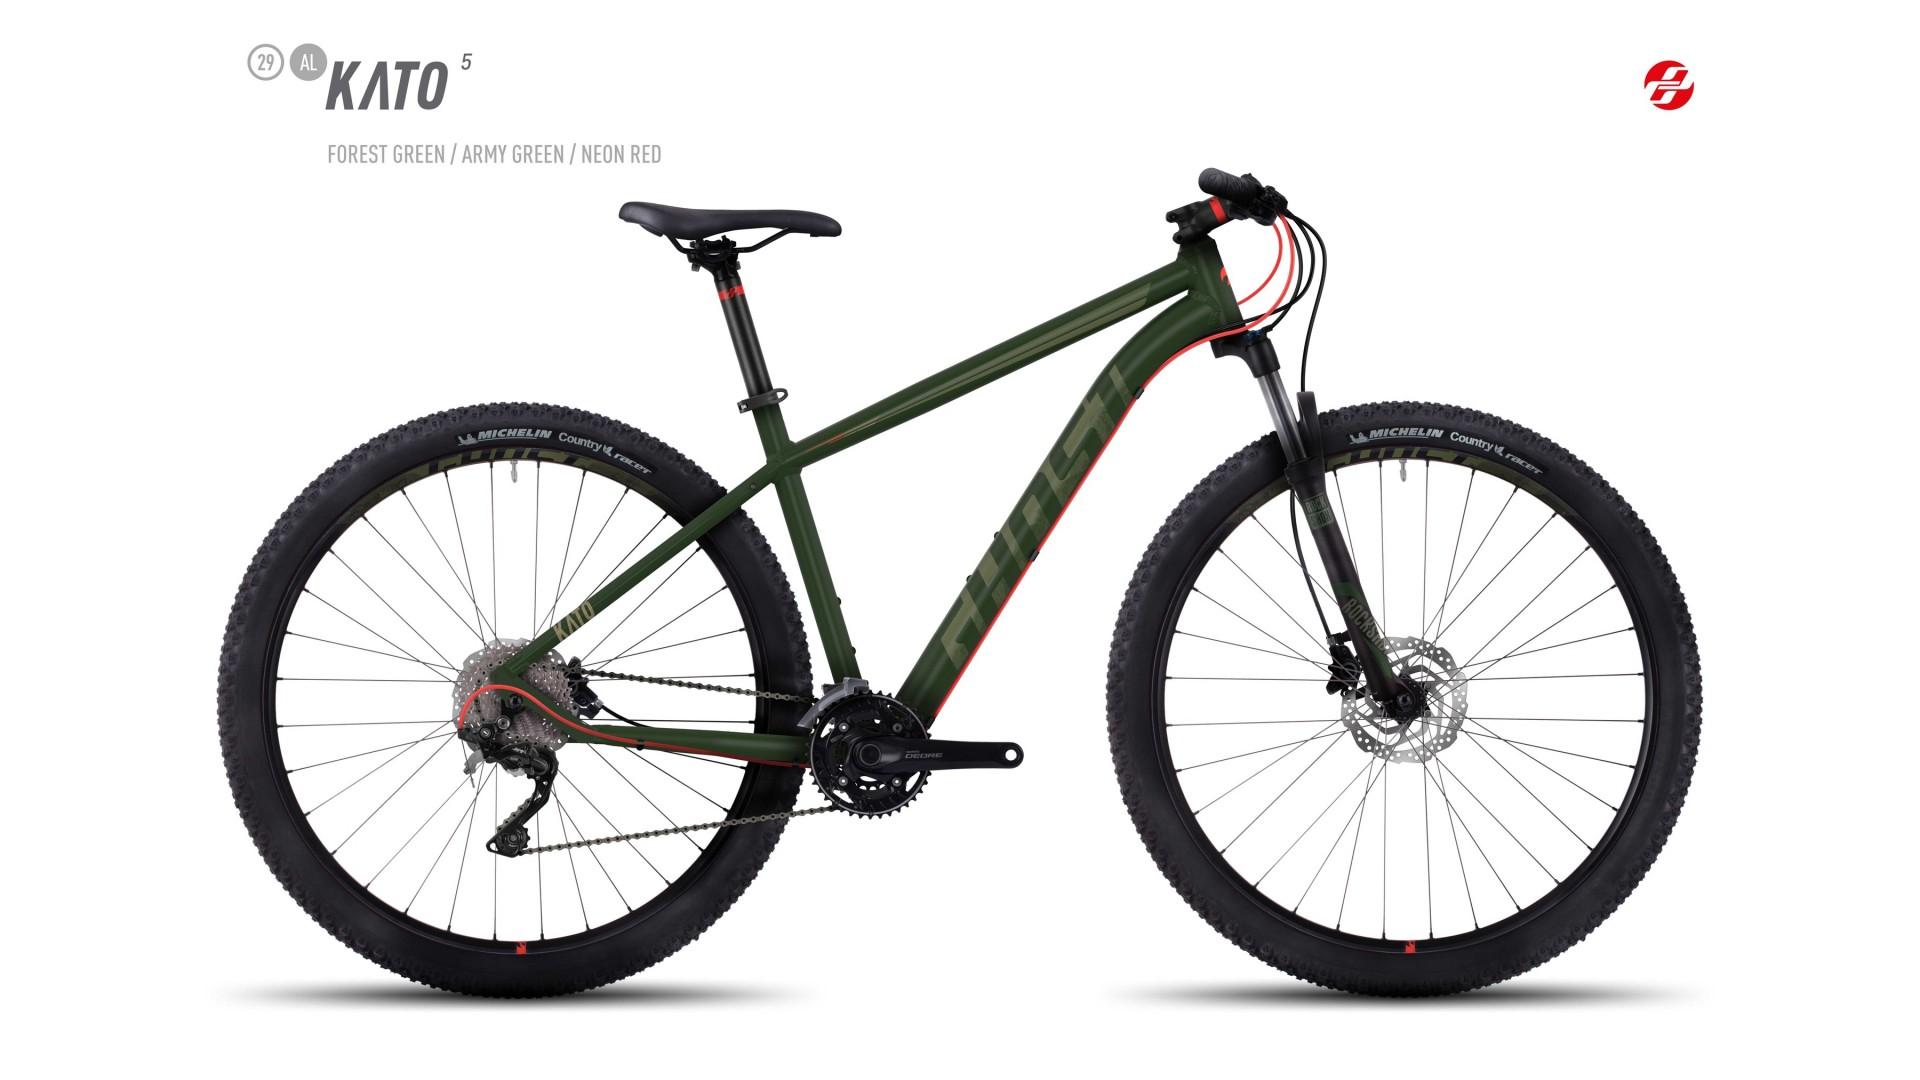 Велосипед GHOST Kato 5 AL 29 forestgreen/armygreen/neonred год 2017